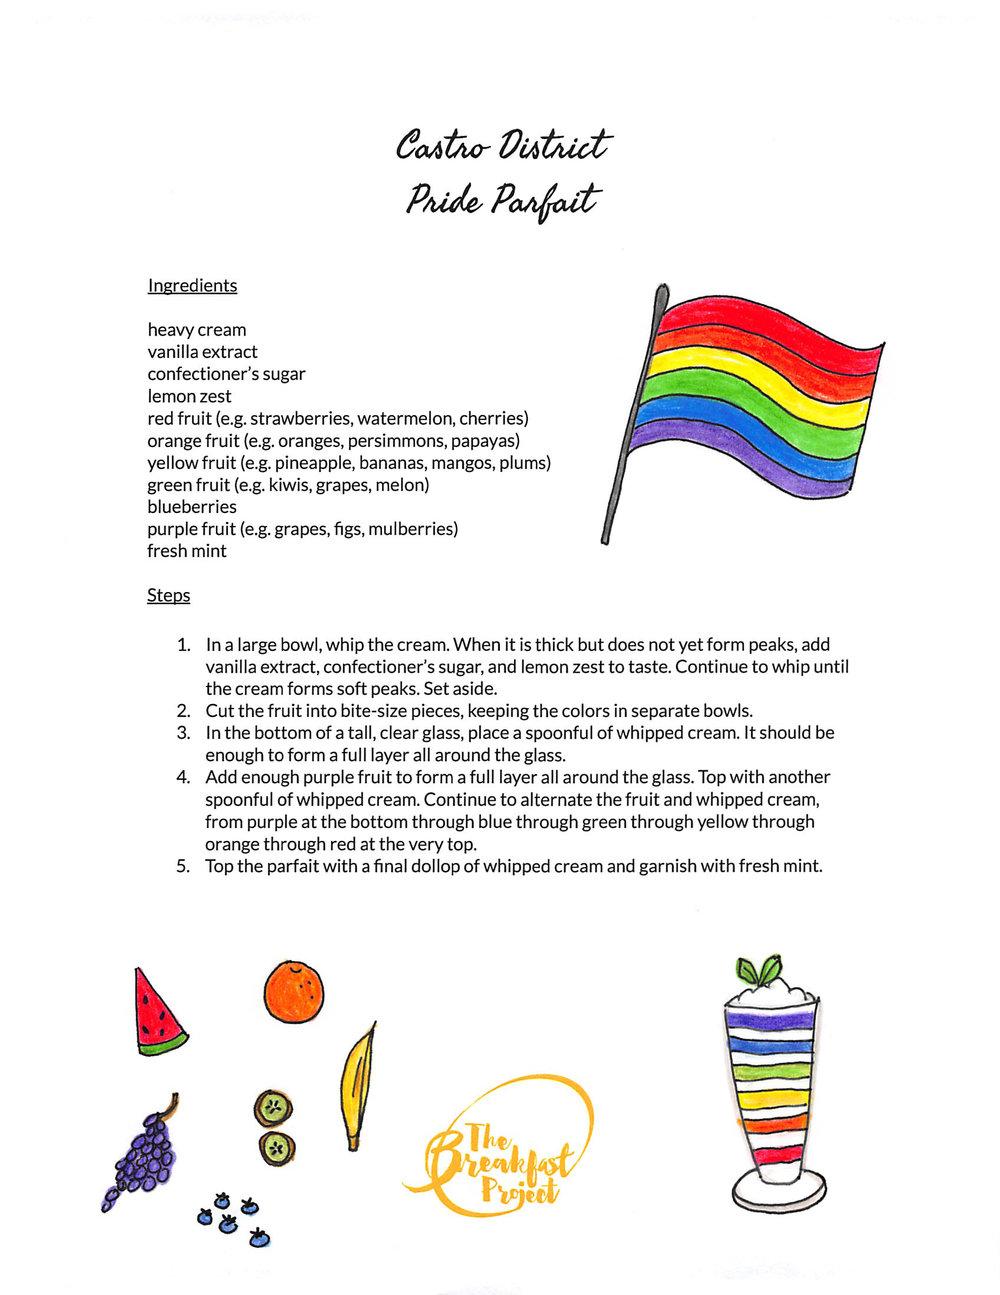 PrideParfaitsmall.jpg